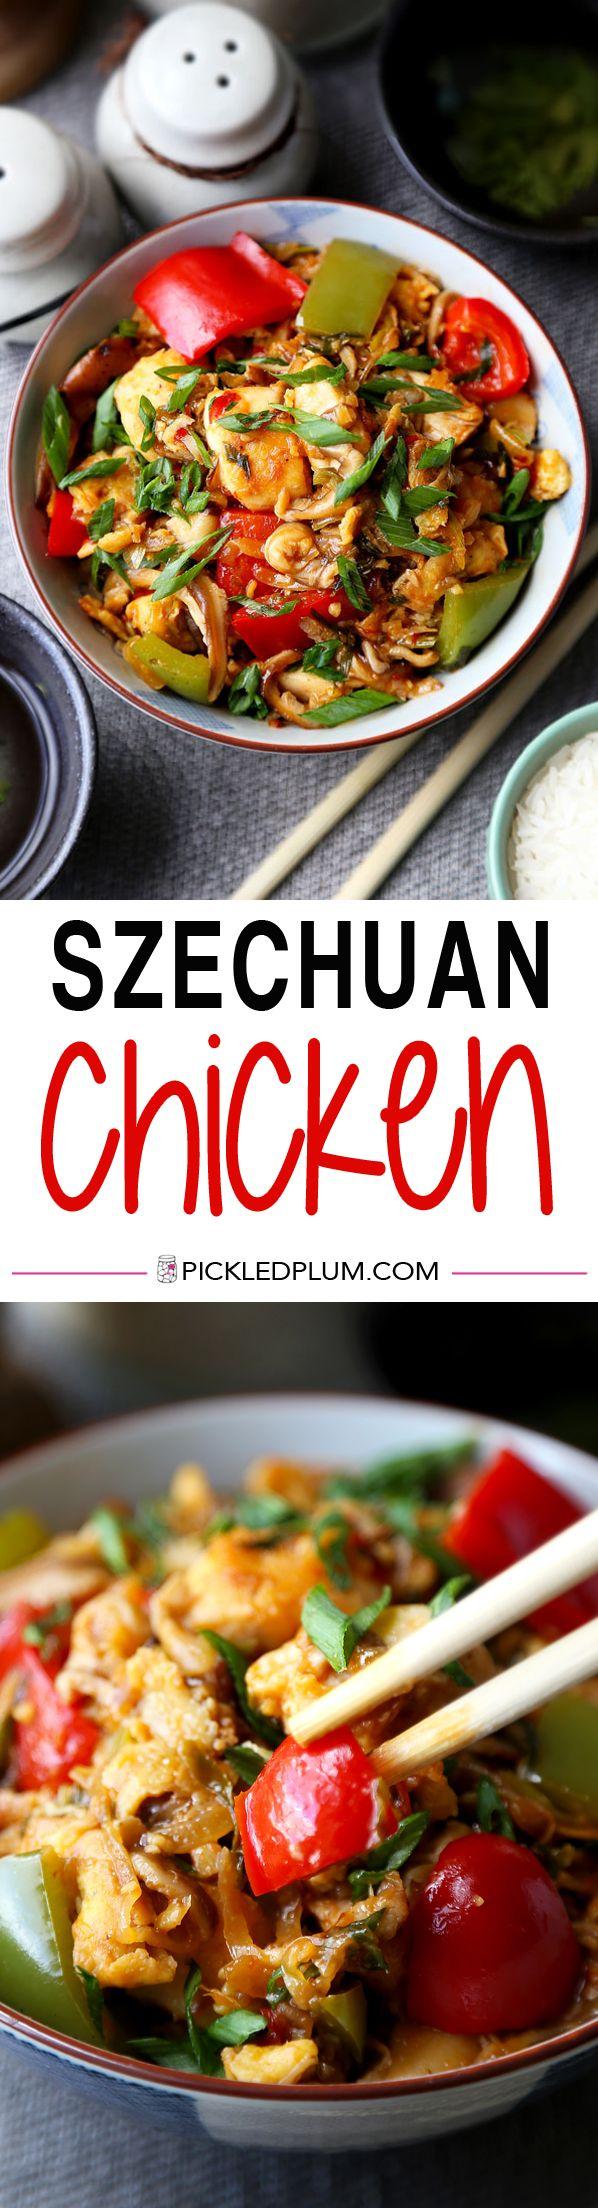 Spicy, healthy and easy Szechuan Chicken Stir Fry Recipe - ready in 25 minutes! http://www.pickledplum.com/szechuan-chicken-recipe/